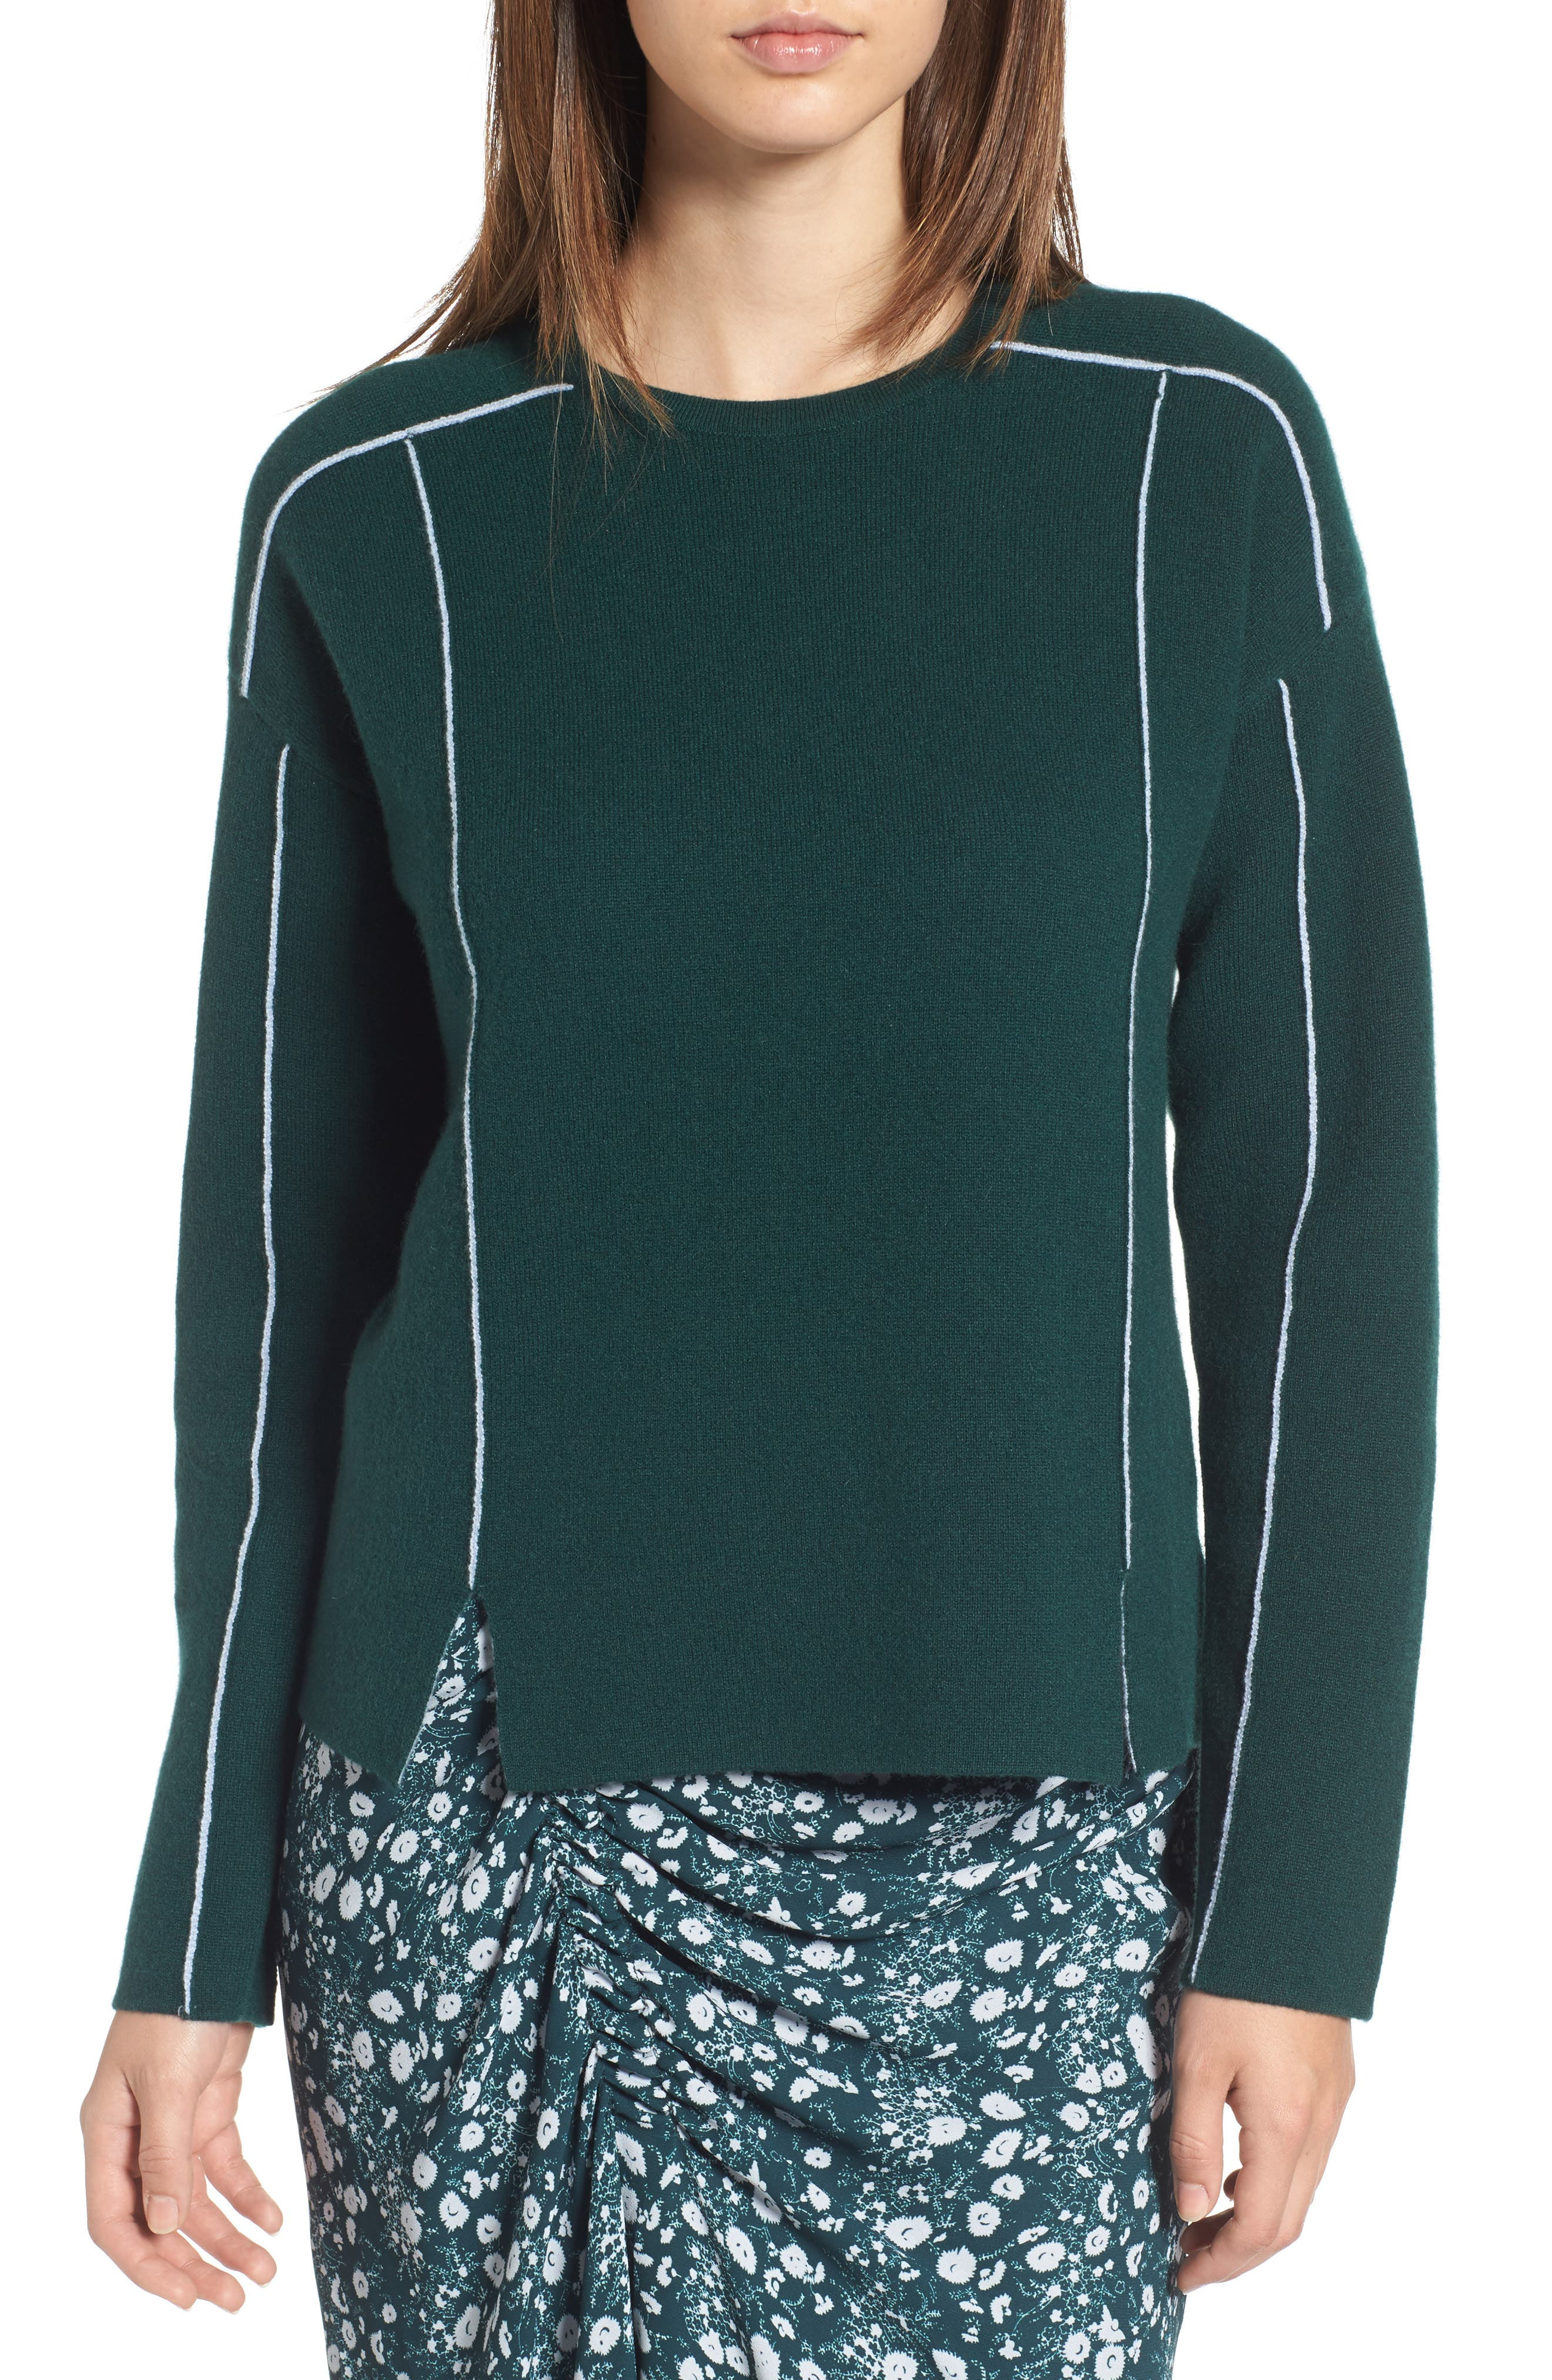 LEWIT Double Knit Cashmere Blend Pullover